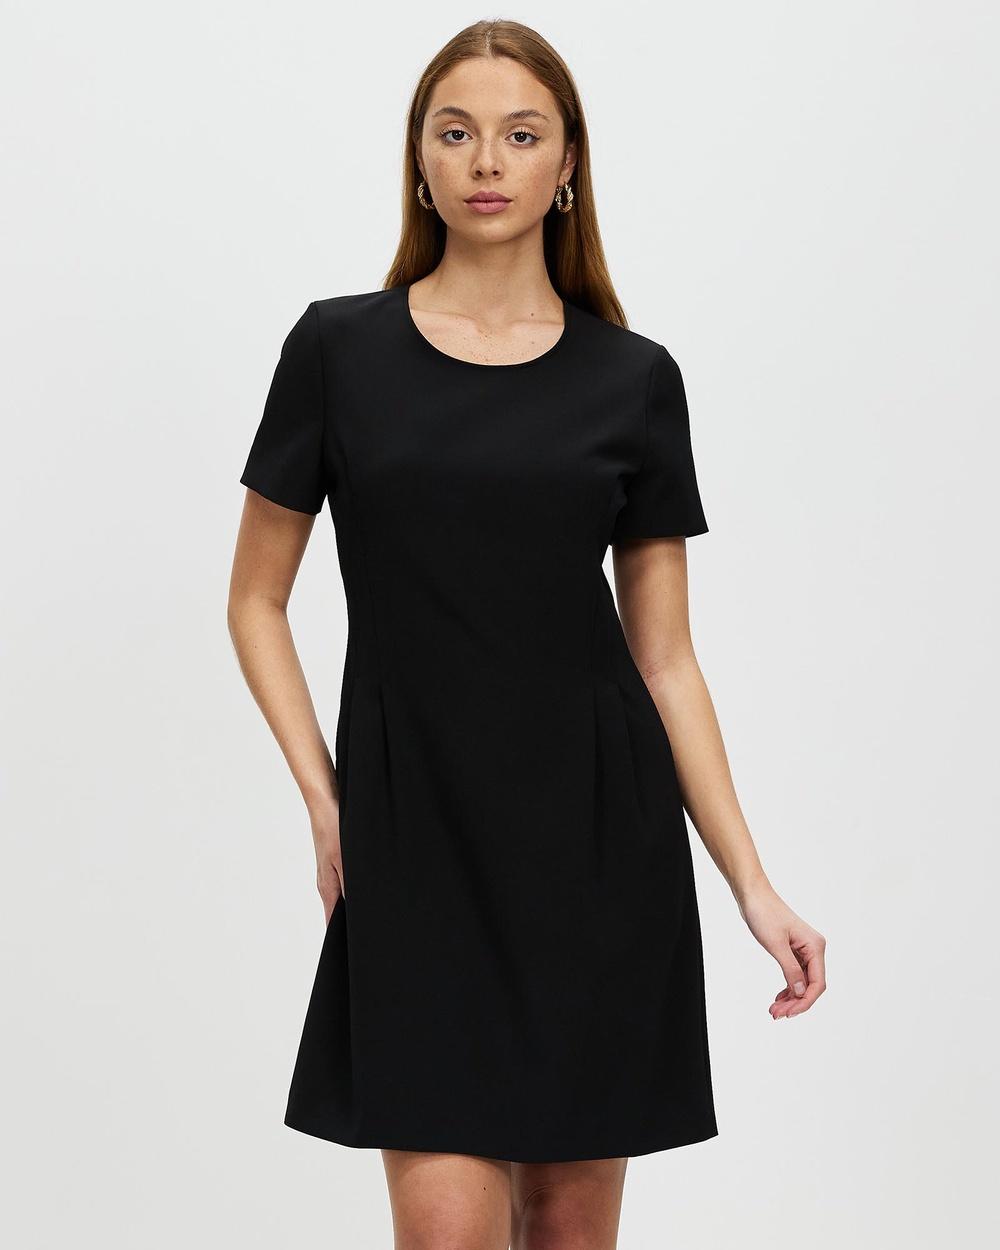 Marcs Apple Of My Eye Crepe Dress Dresses BLACK